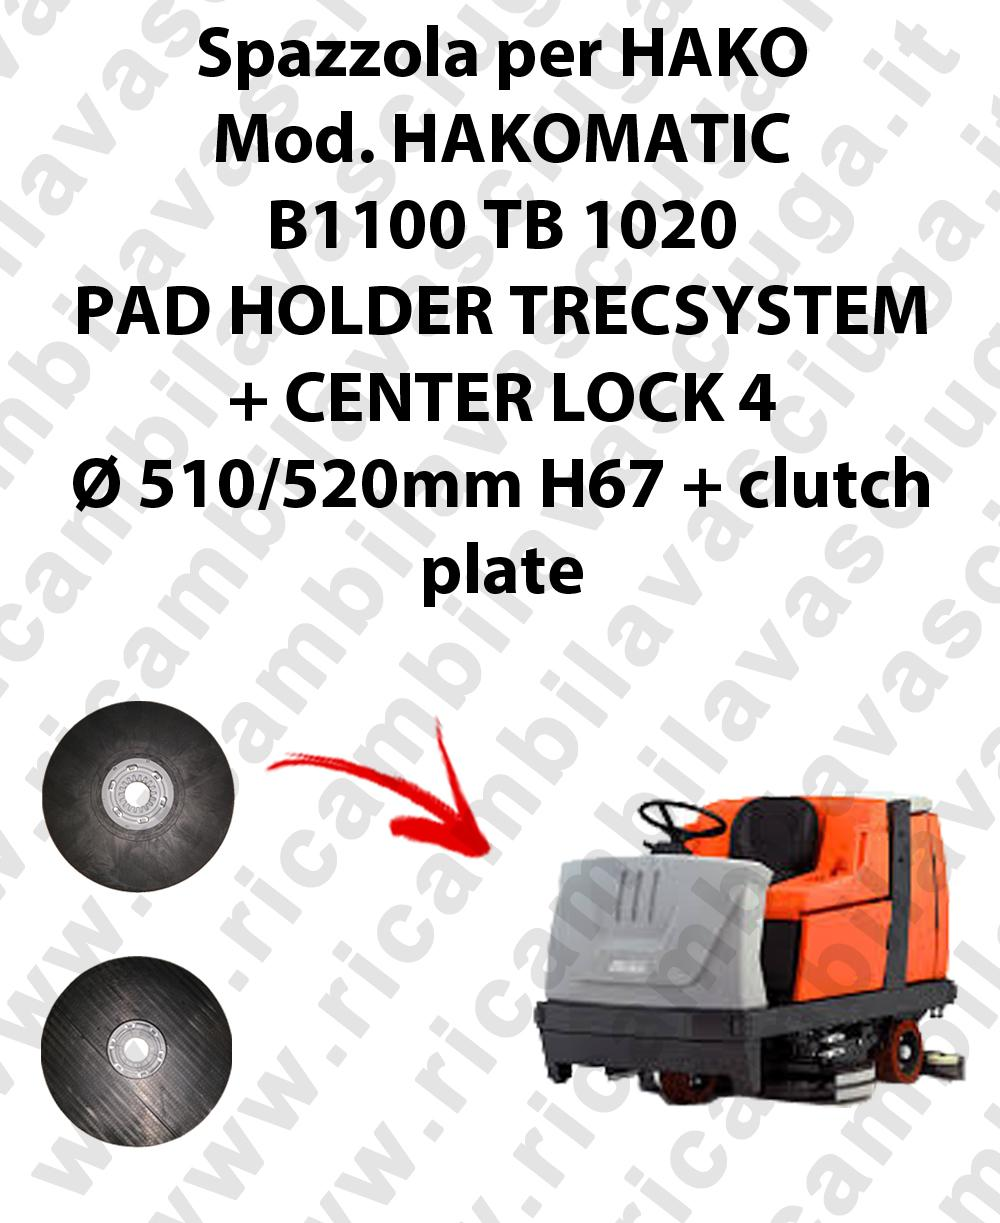 PAD HOLDER TRECSYSTEM  pour autolaveuses HAKO Reference HAKOMATIC B1100 TB 1020